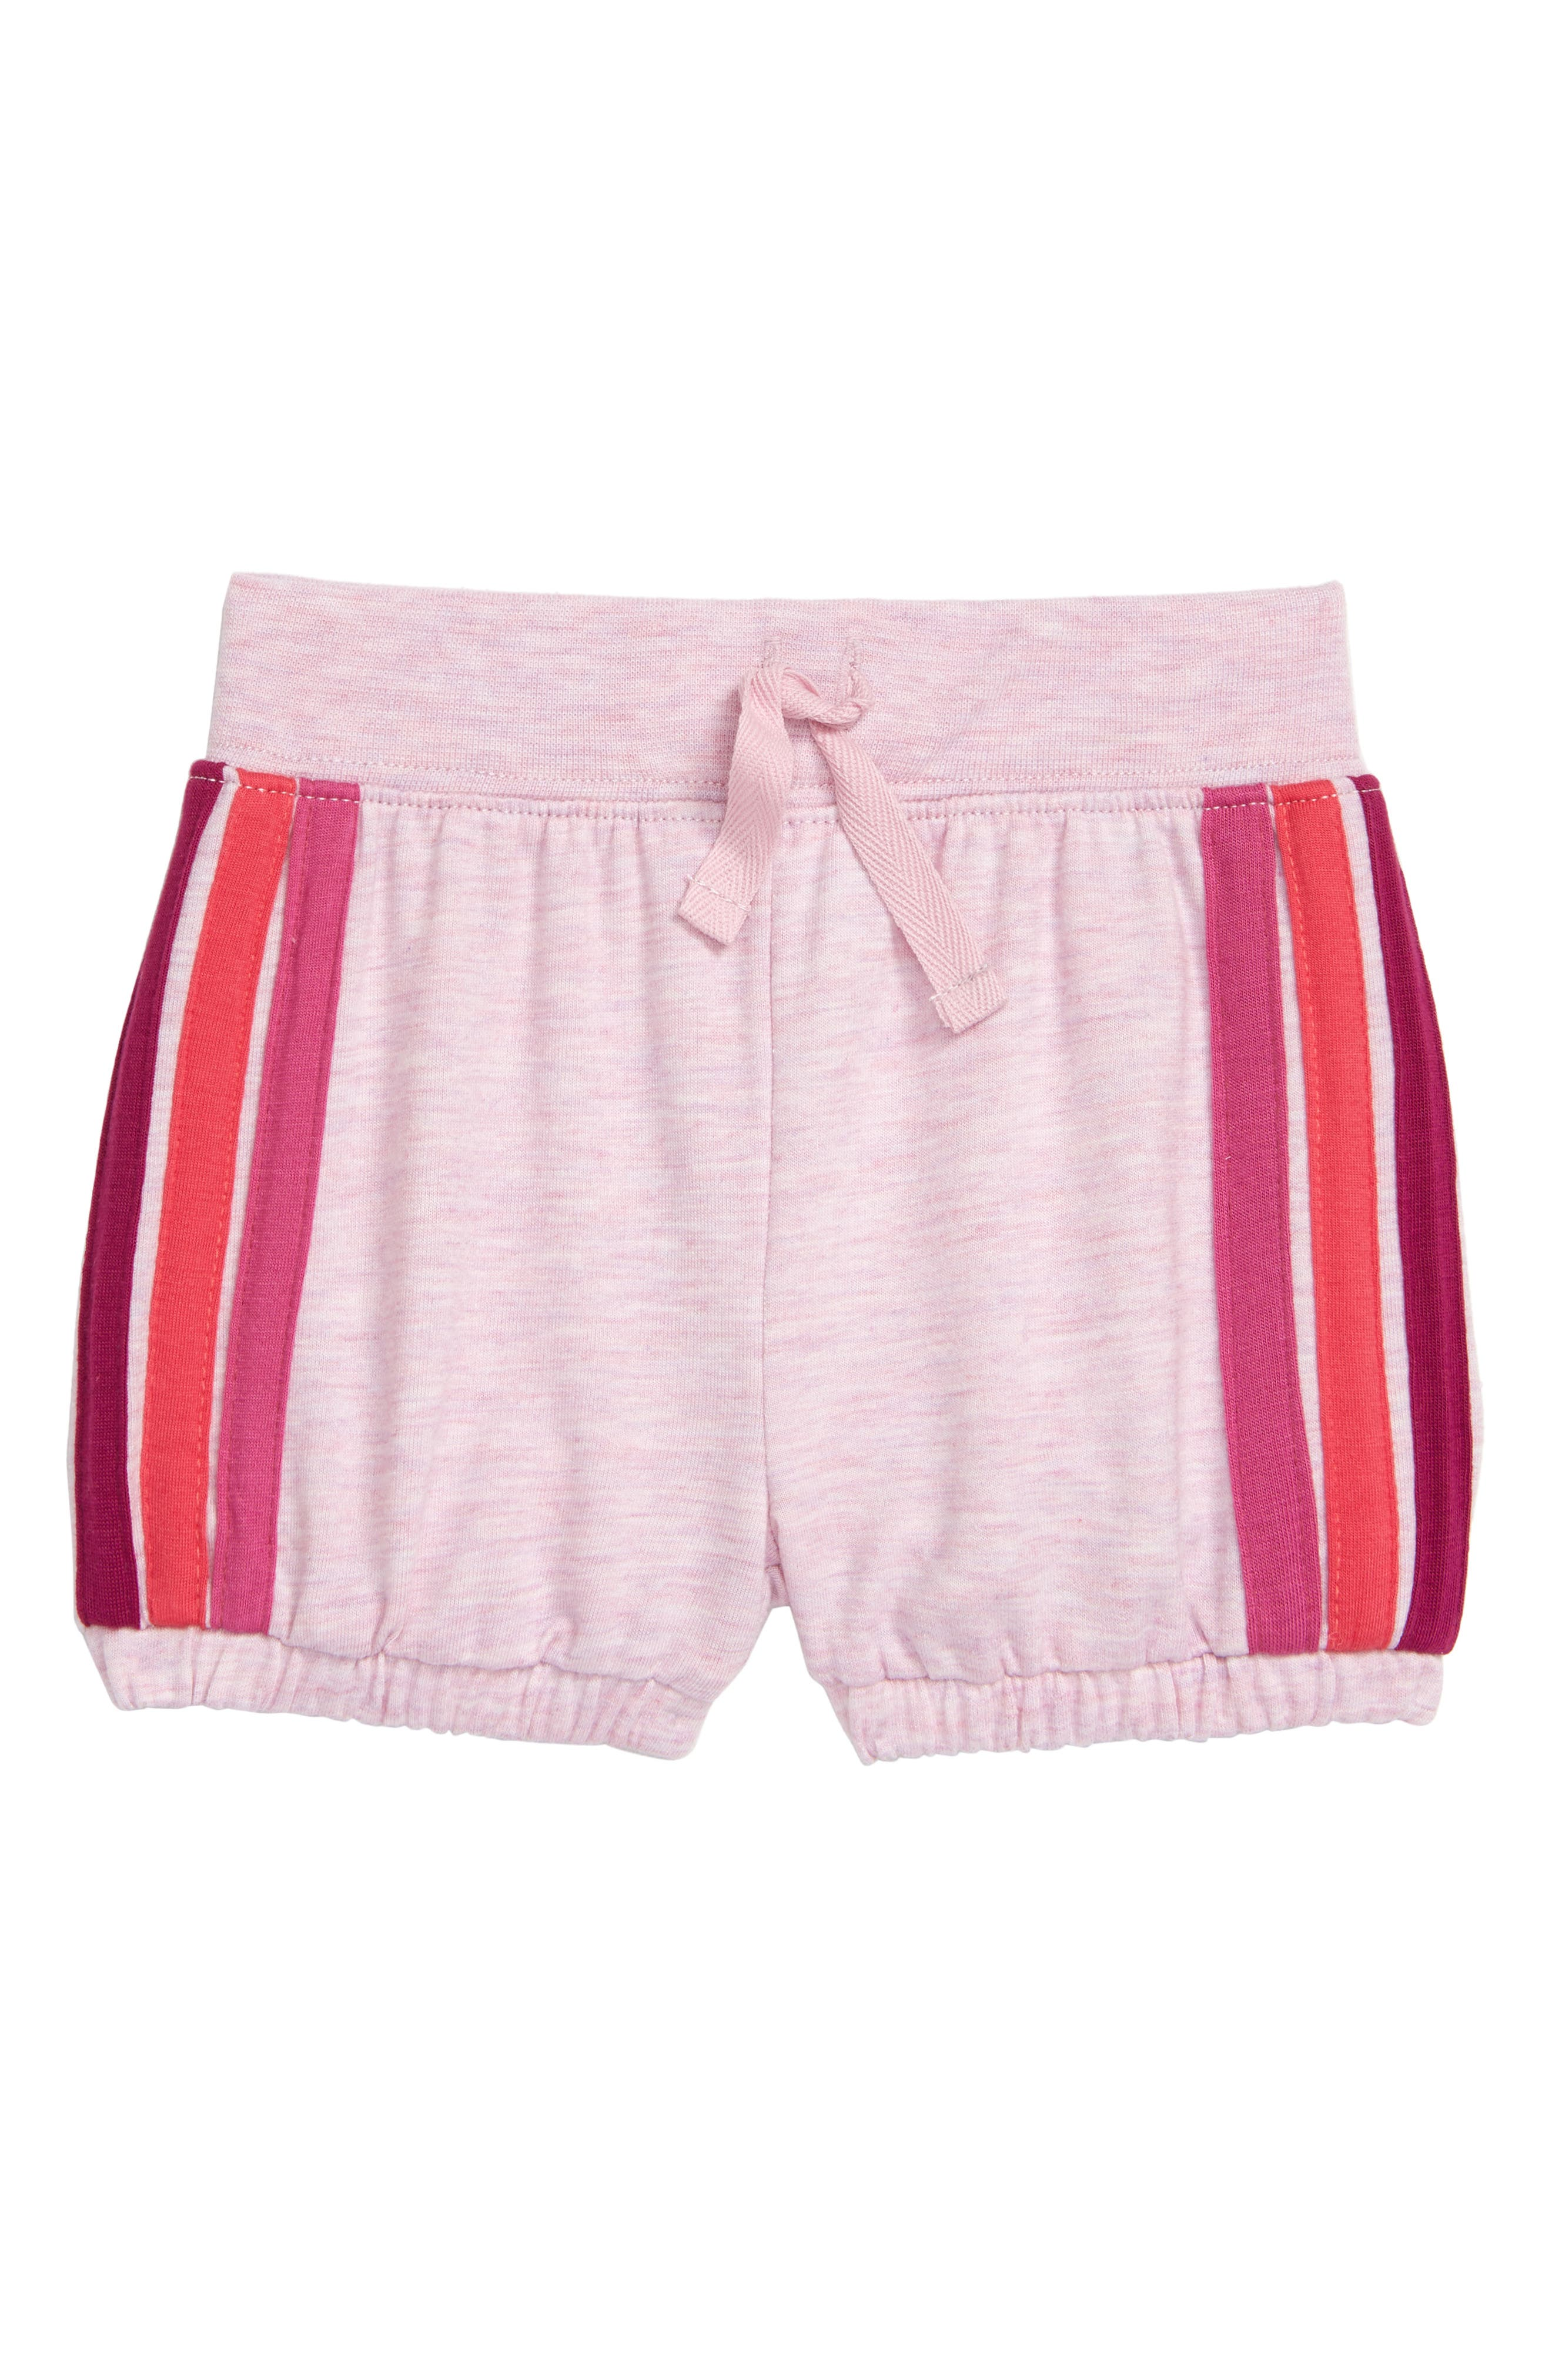 Image of Splendid Sporty Stripe Bloomer Shorts